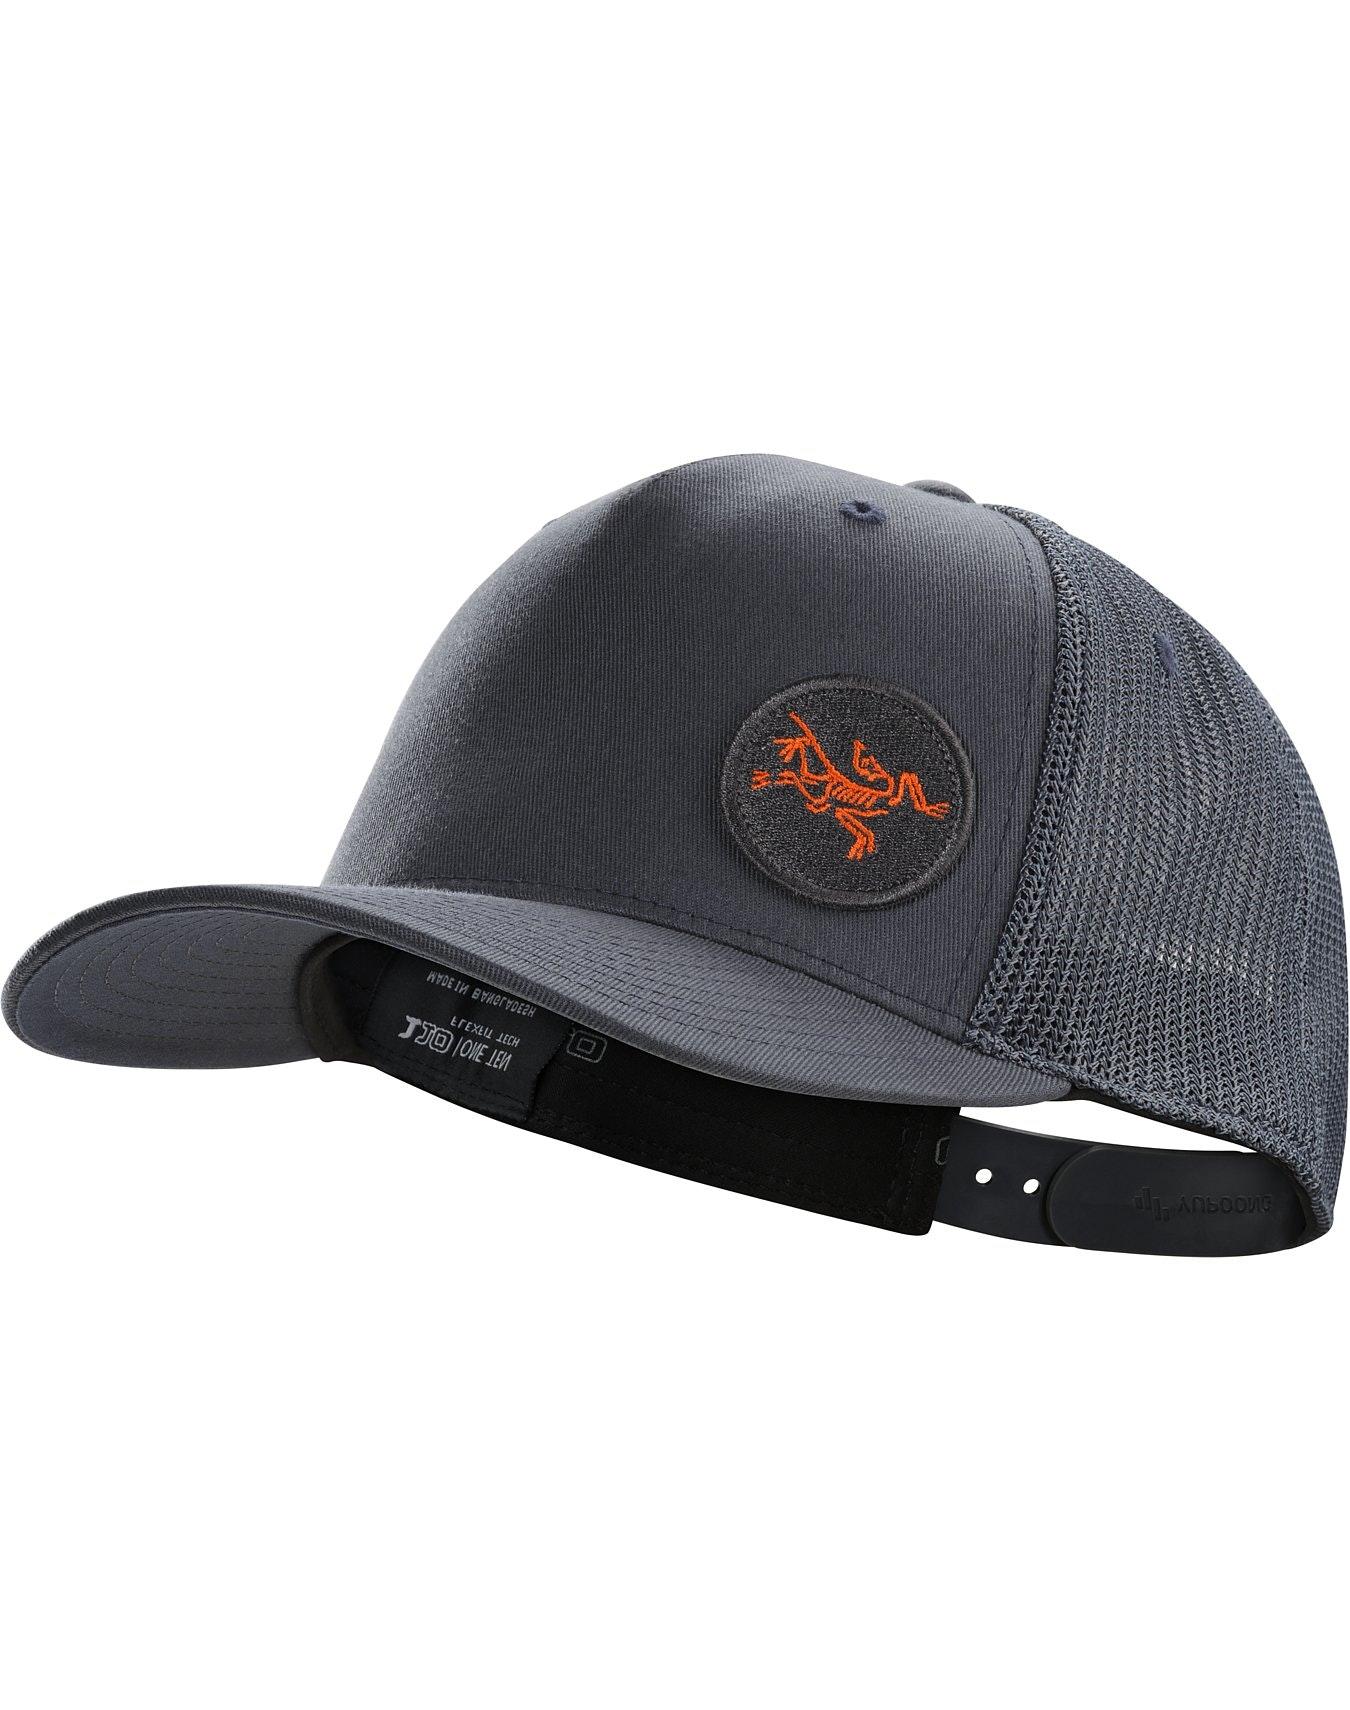 Patch Trucker Hat   Arc teryx 975c87781a51